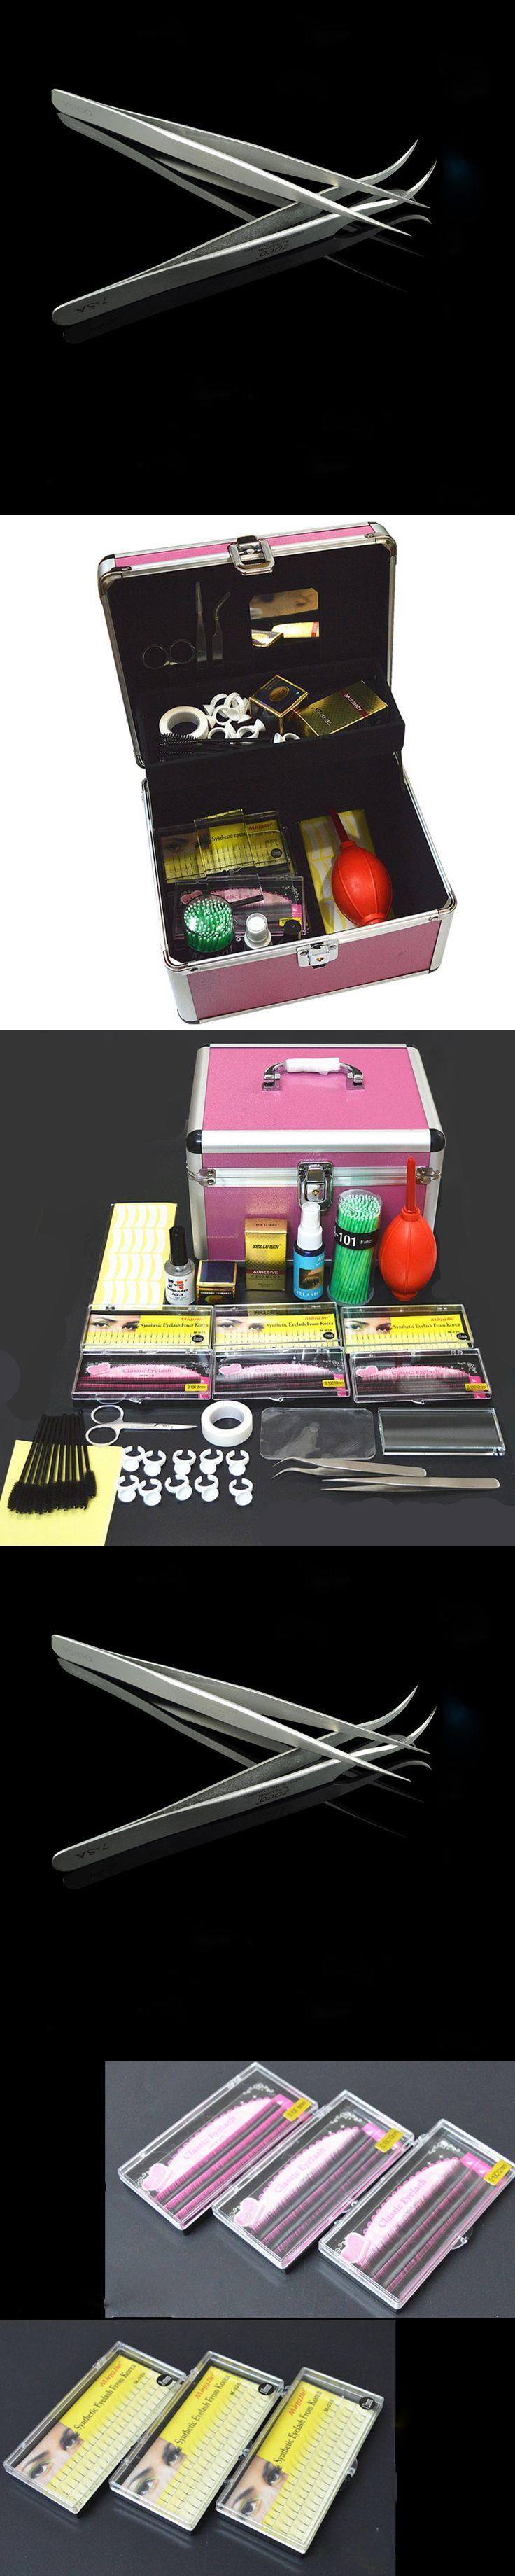 1 Set Professional Portable Eyelashes Extension Kit Beauty Grafting Eyelash with Box Case for Beauty Salon Makeup